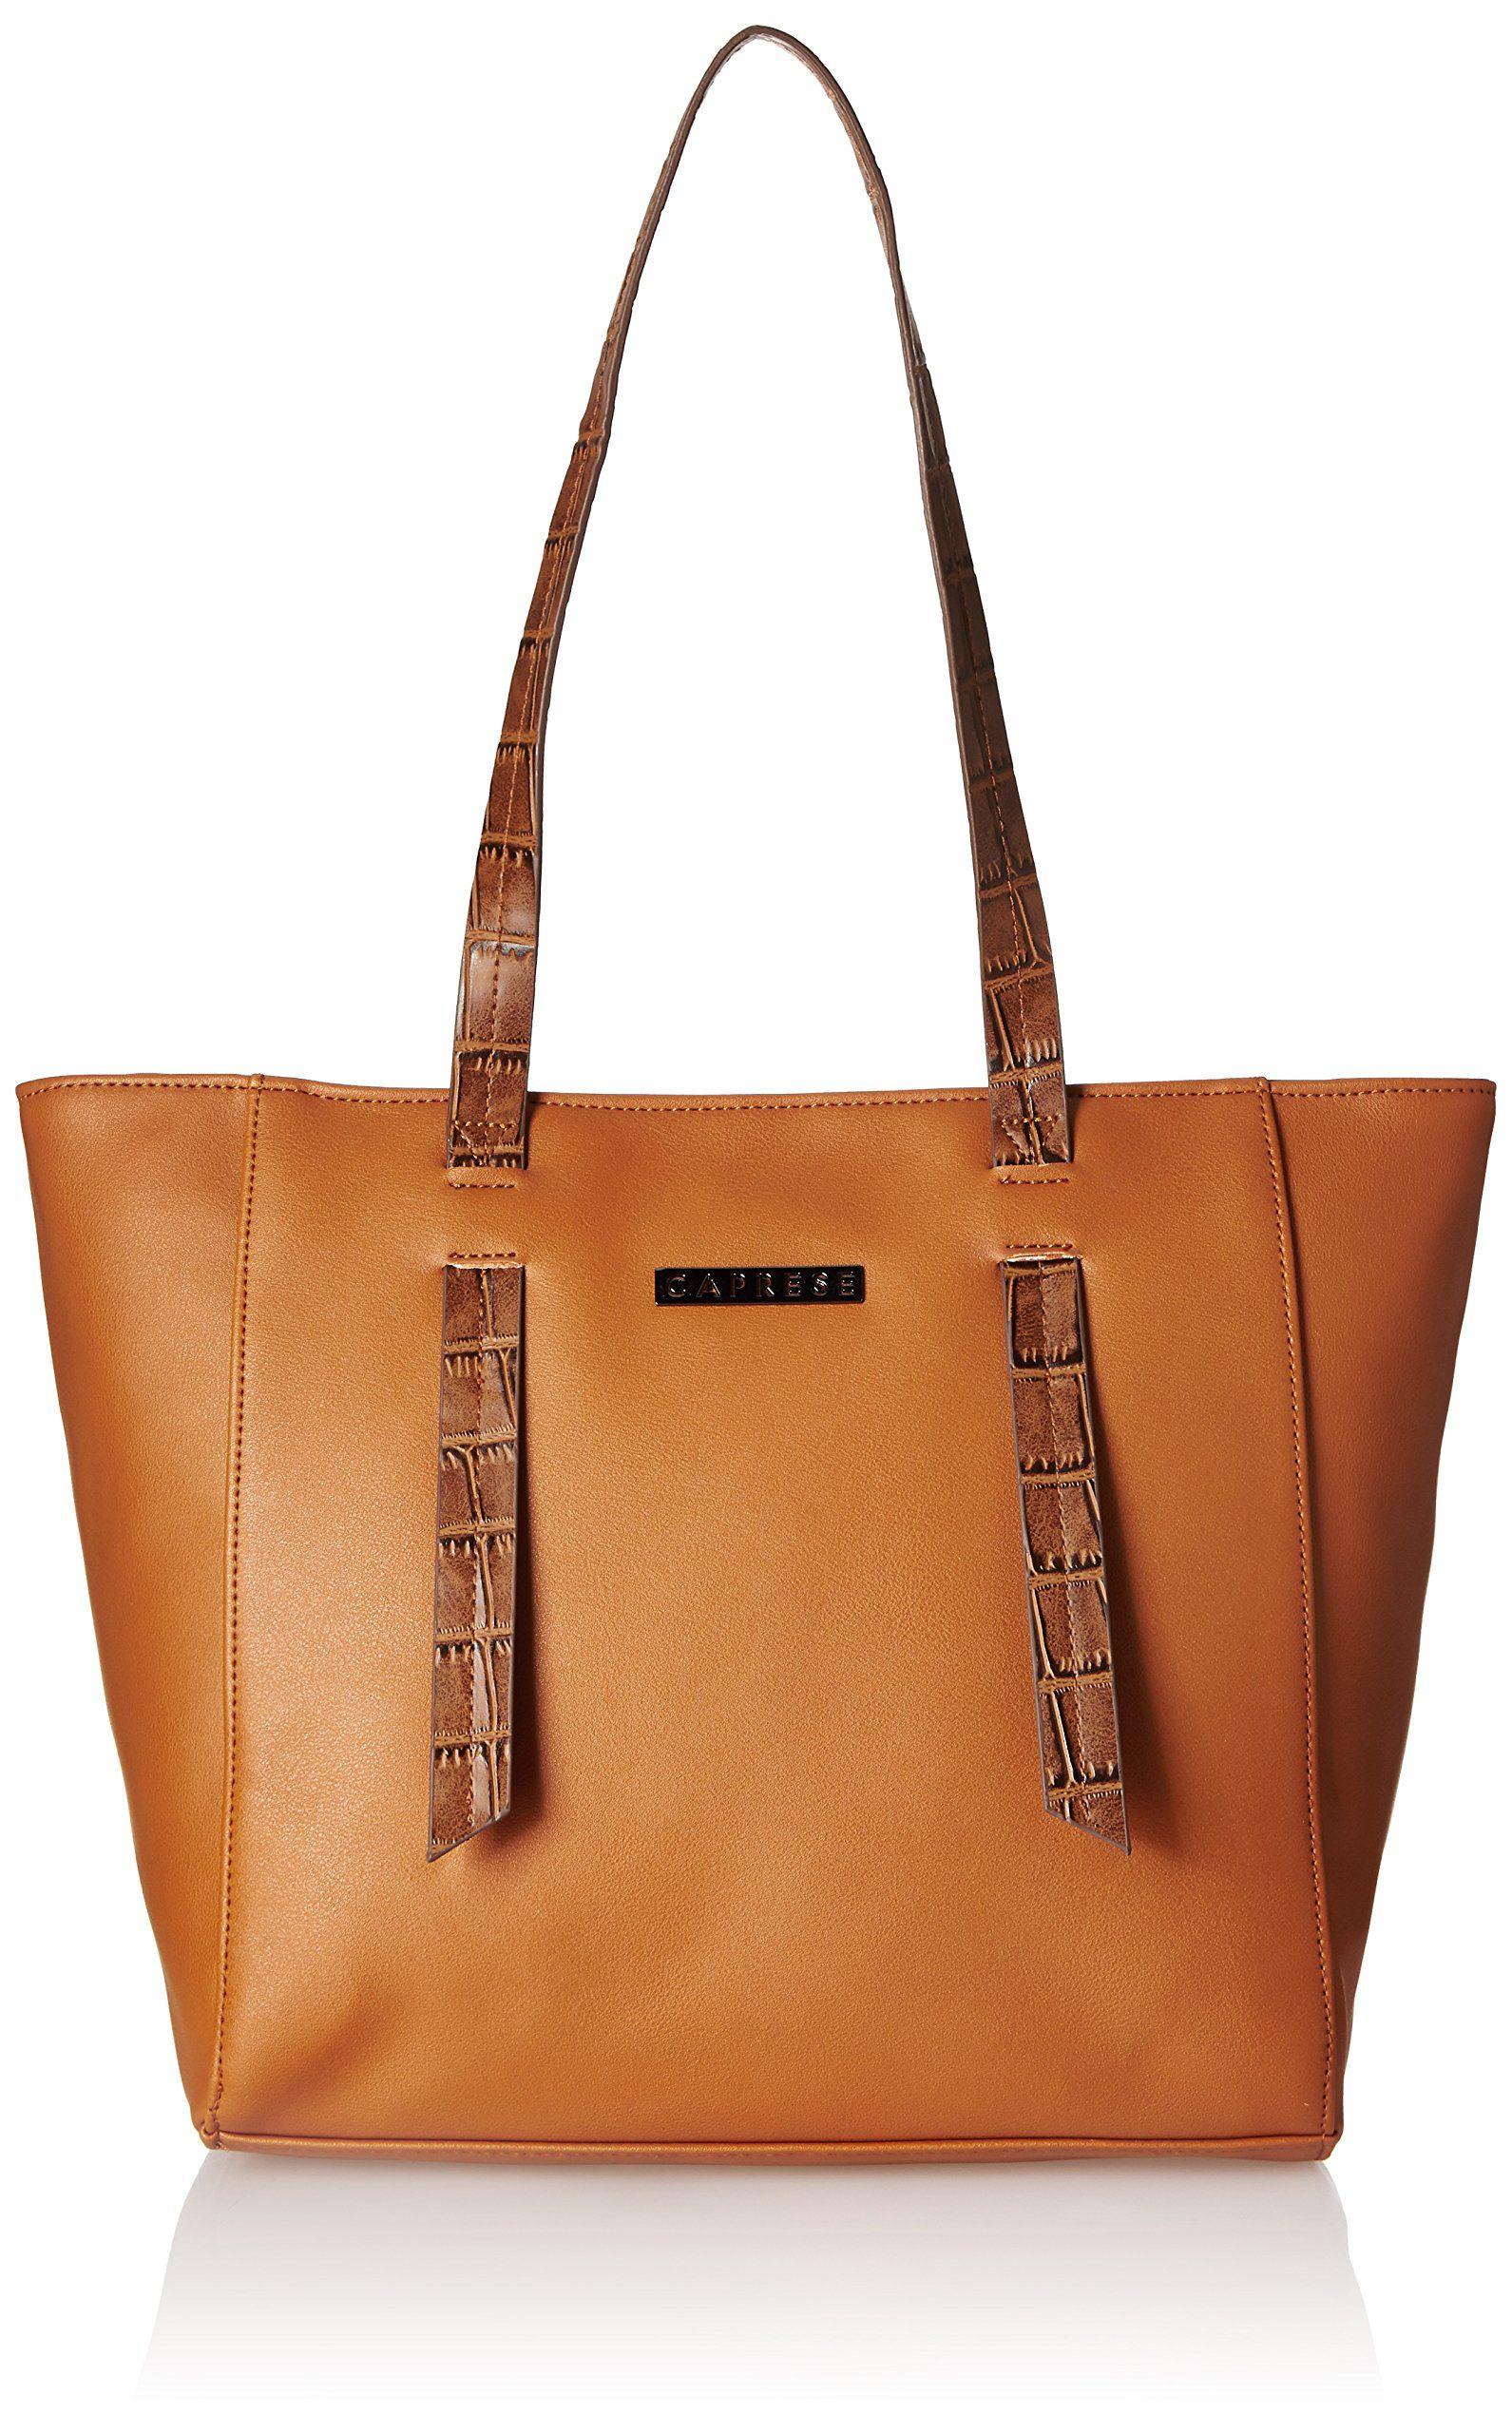 3b6f319a7c53 Caprese Evana Women s Tote Bag (Tan) -